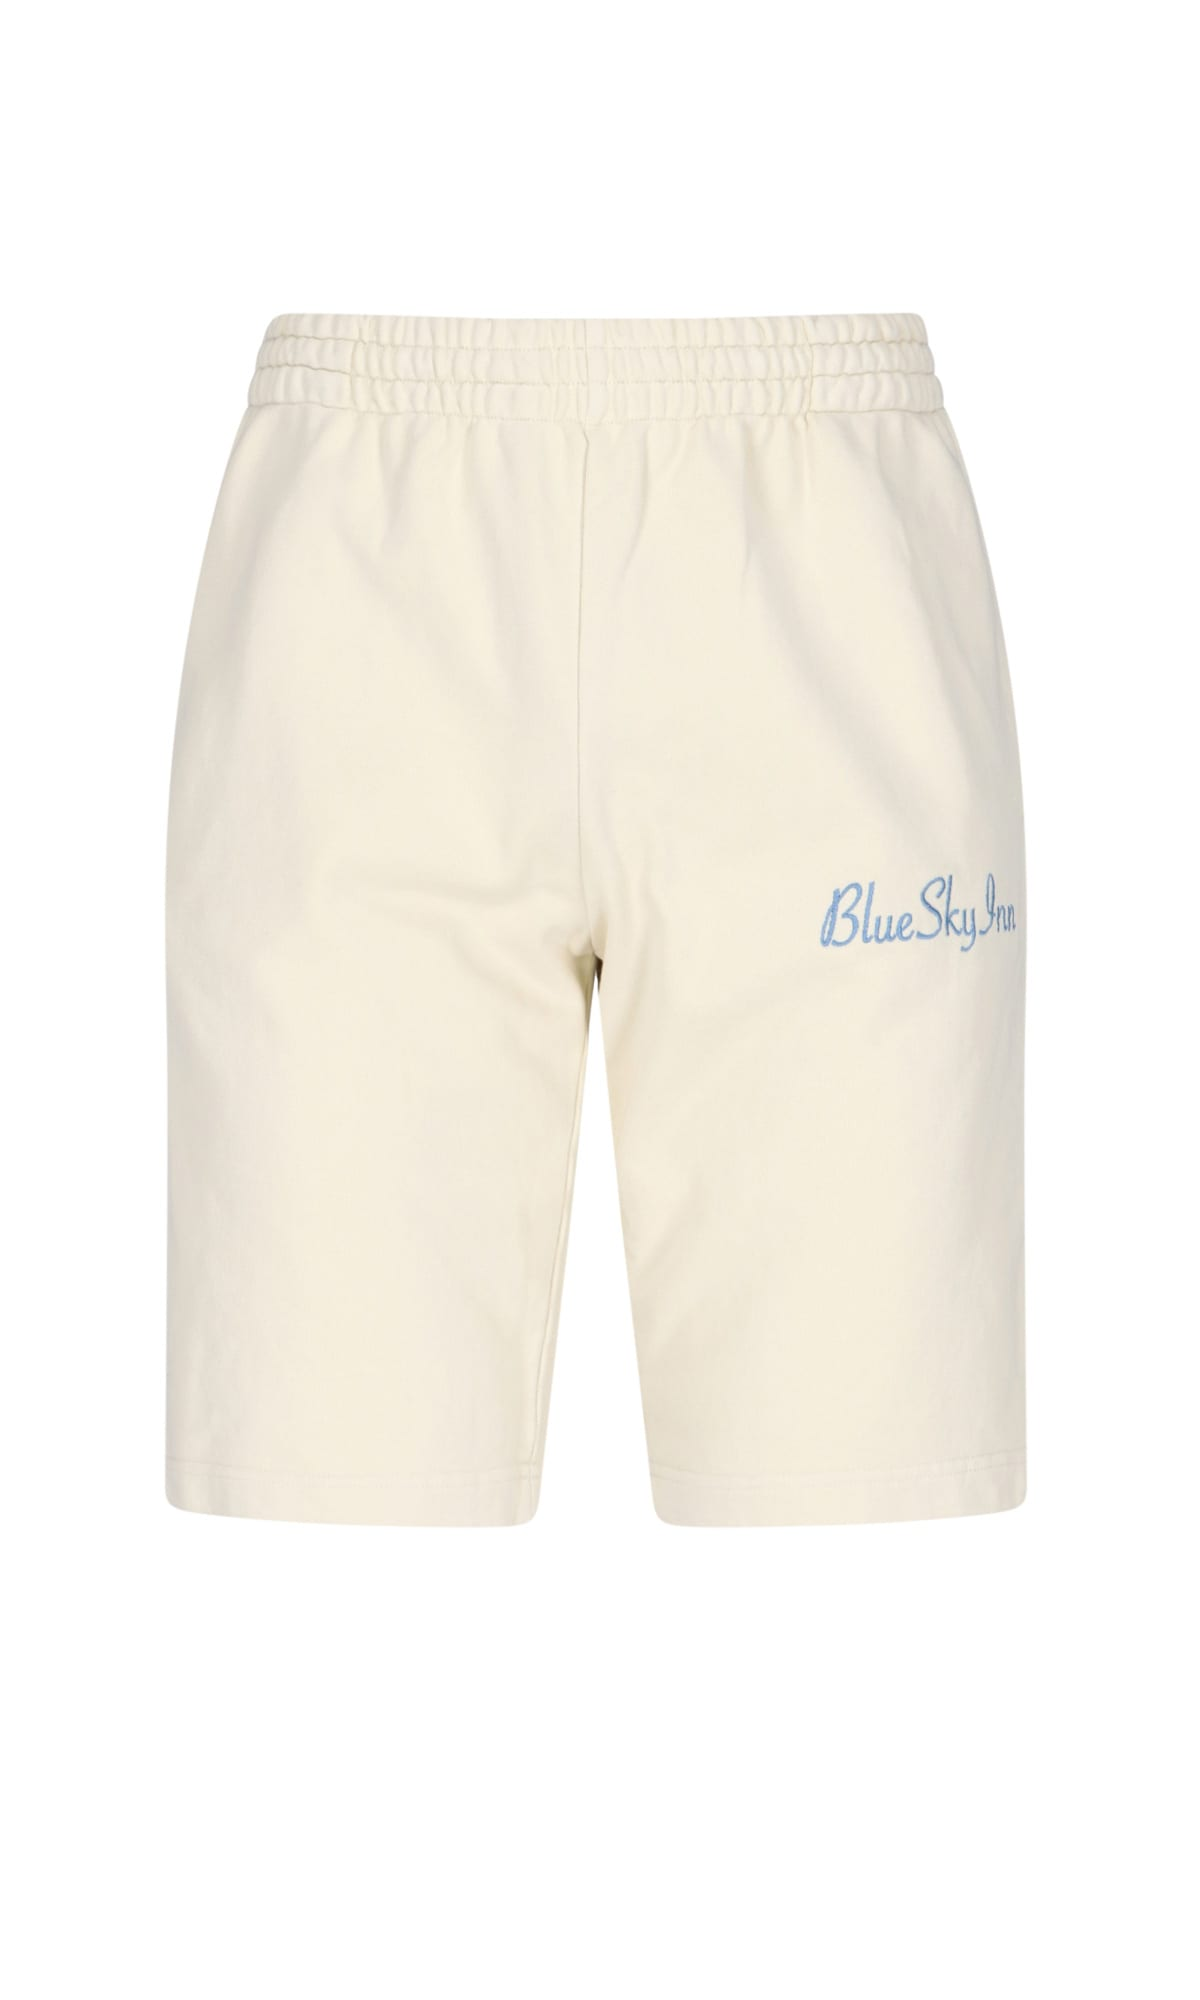 Blue Sky Inn Pants